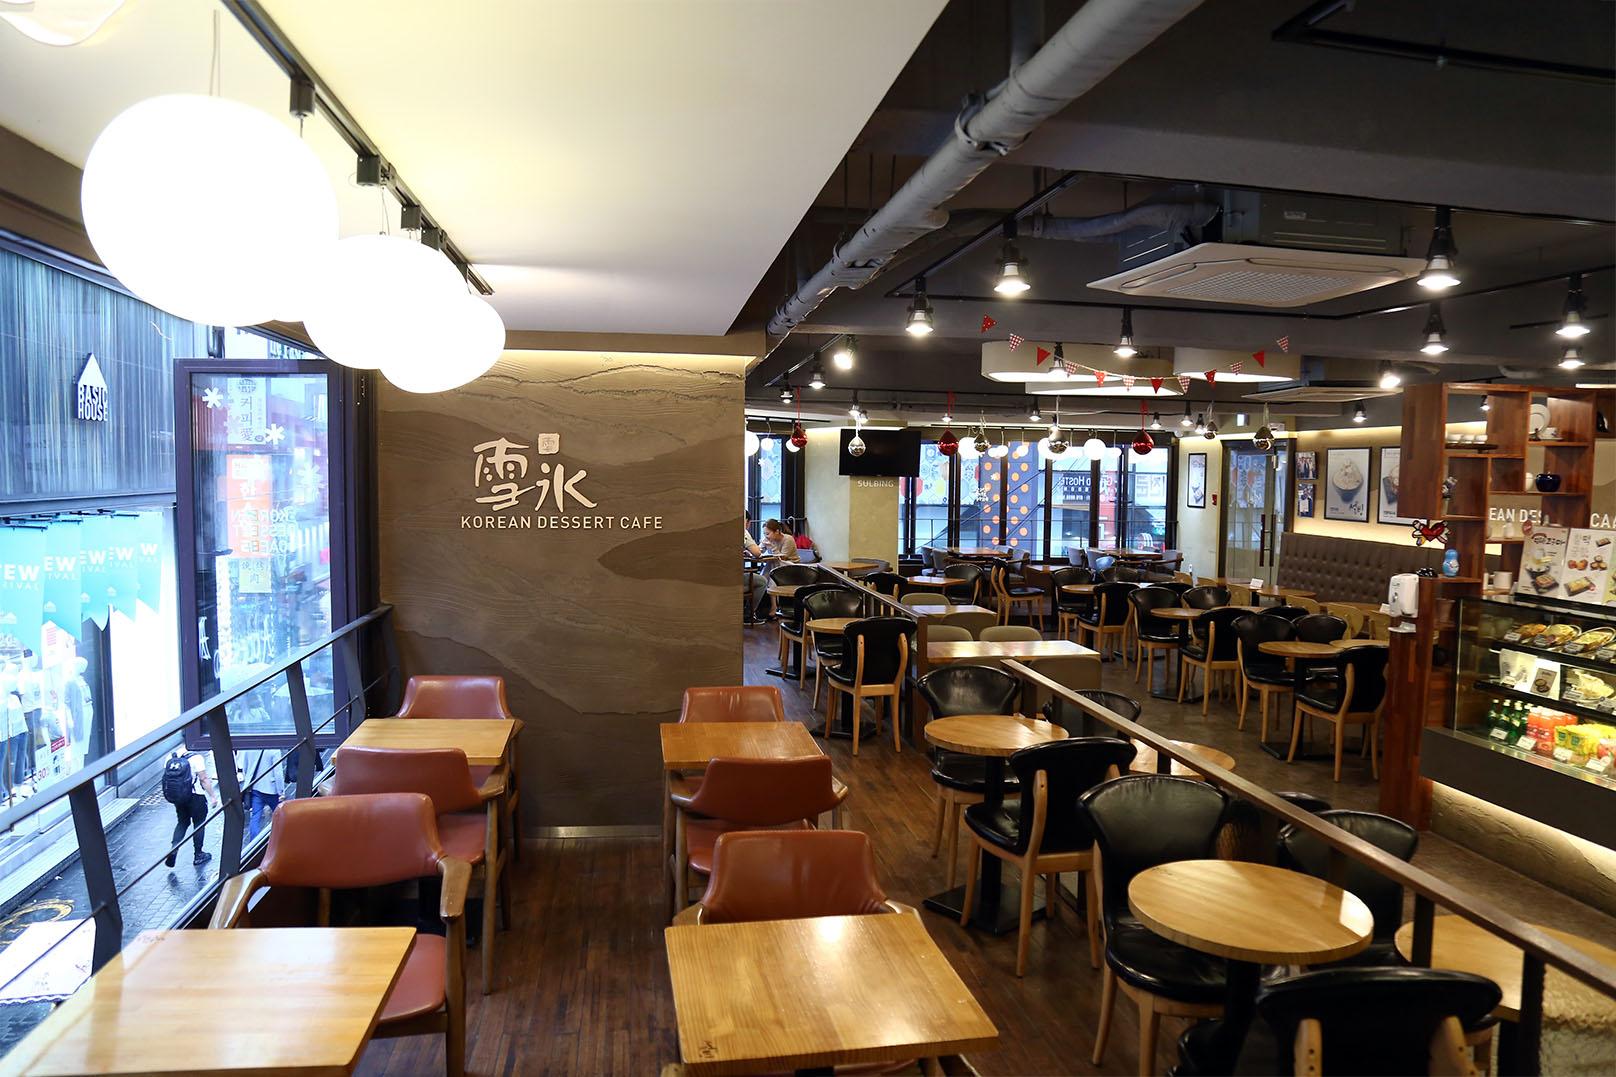 16 of seoul s coolest coffee and dessert shops om nom nomad rh omnomnomad com